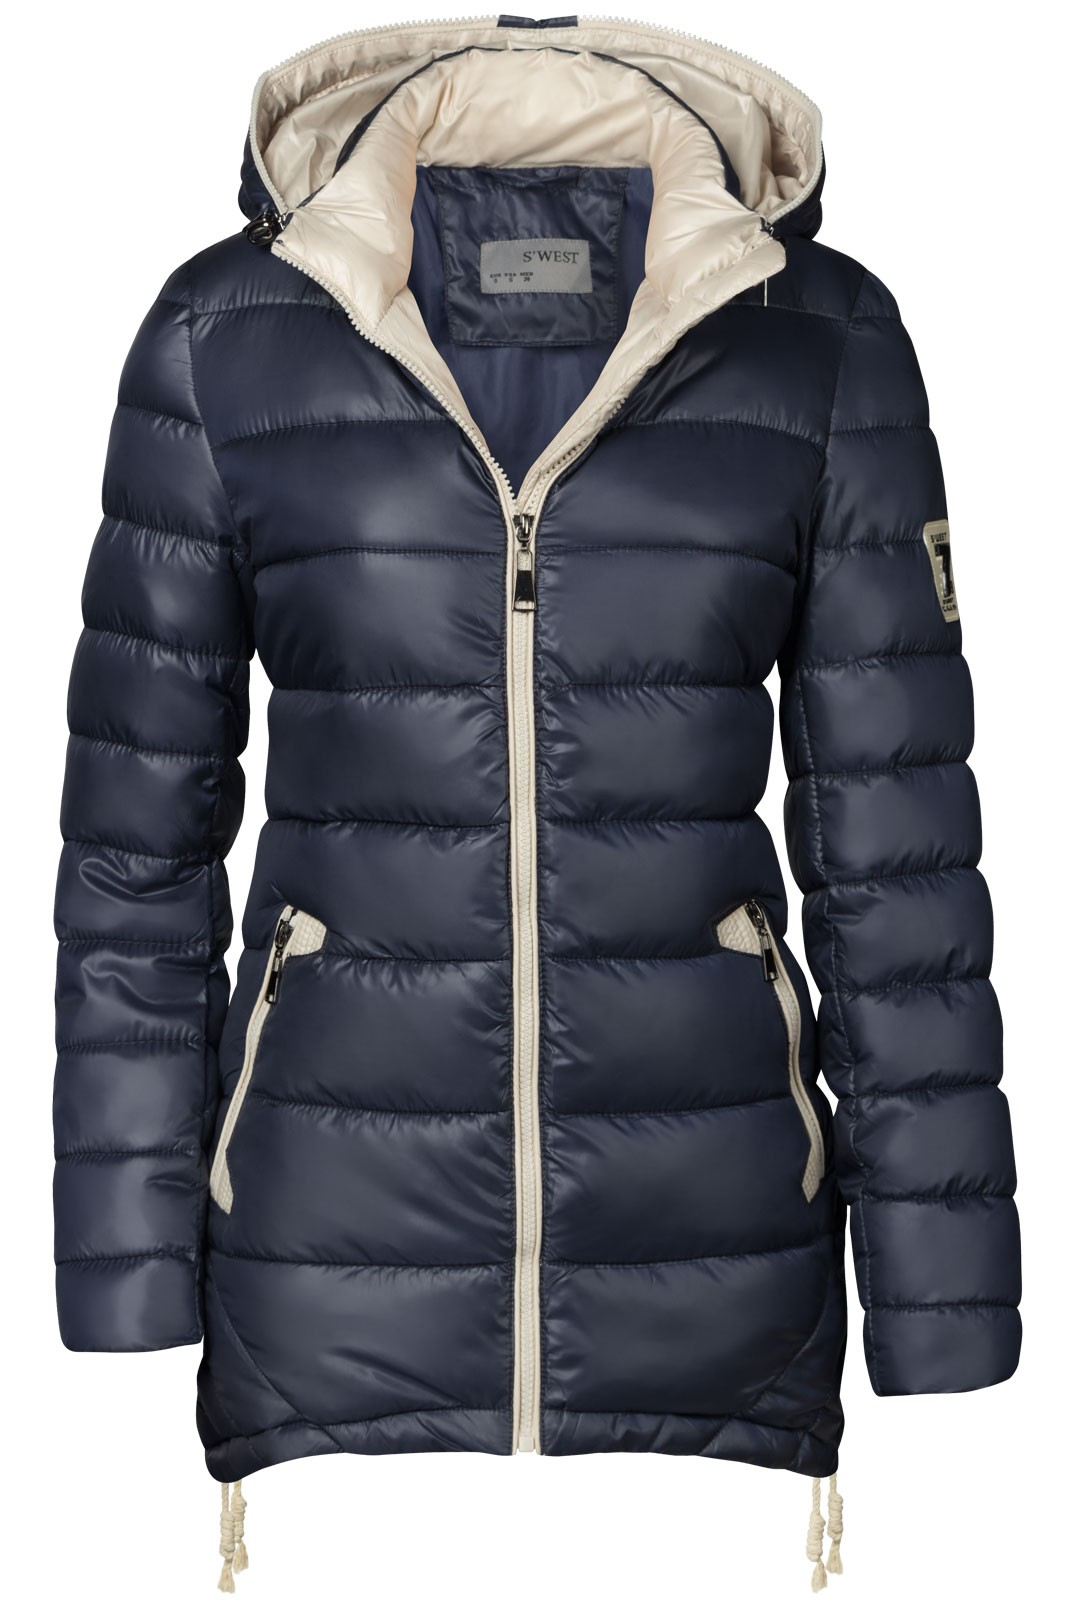 warmer damen stepp winter mantel lang jacke parka steppmantel kapuze zipper ebay. Black Bedroom Furniture Sets. Home Design Ideas